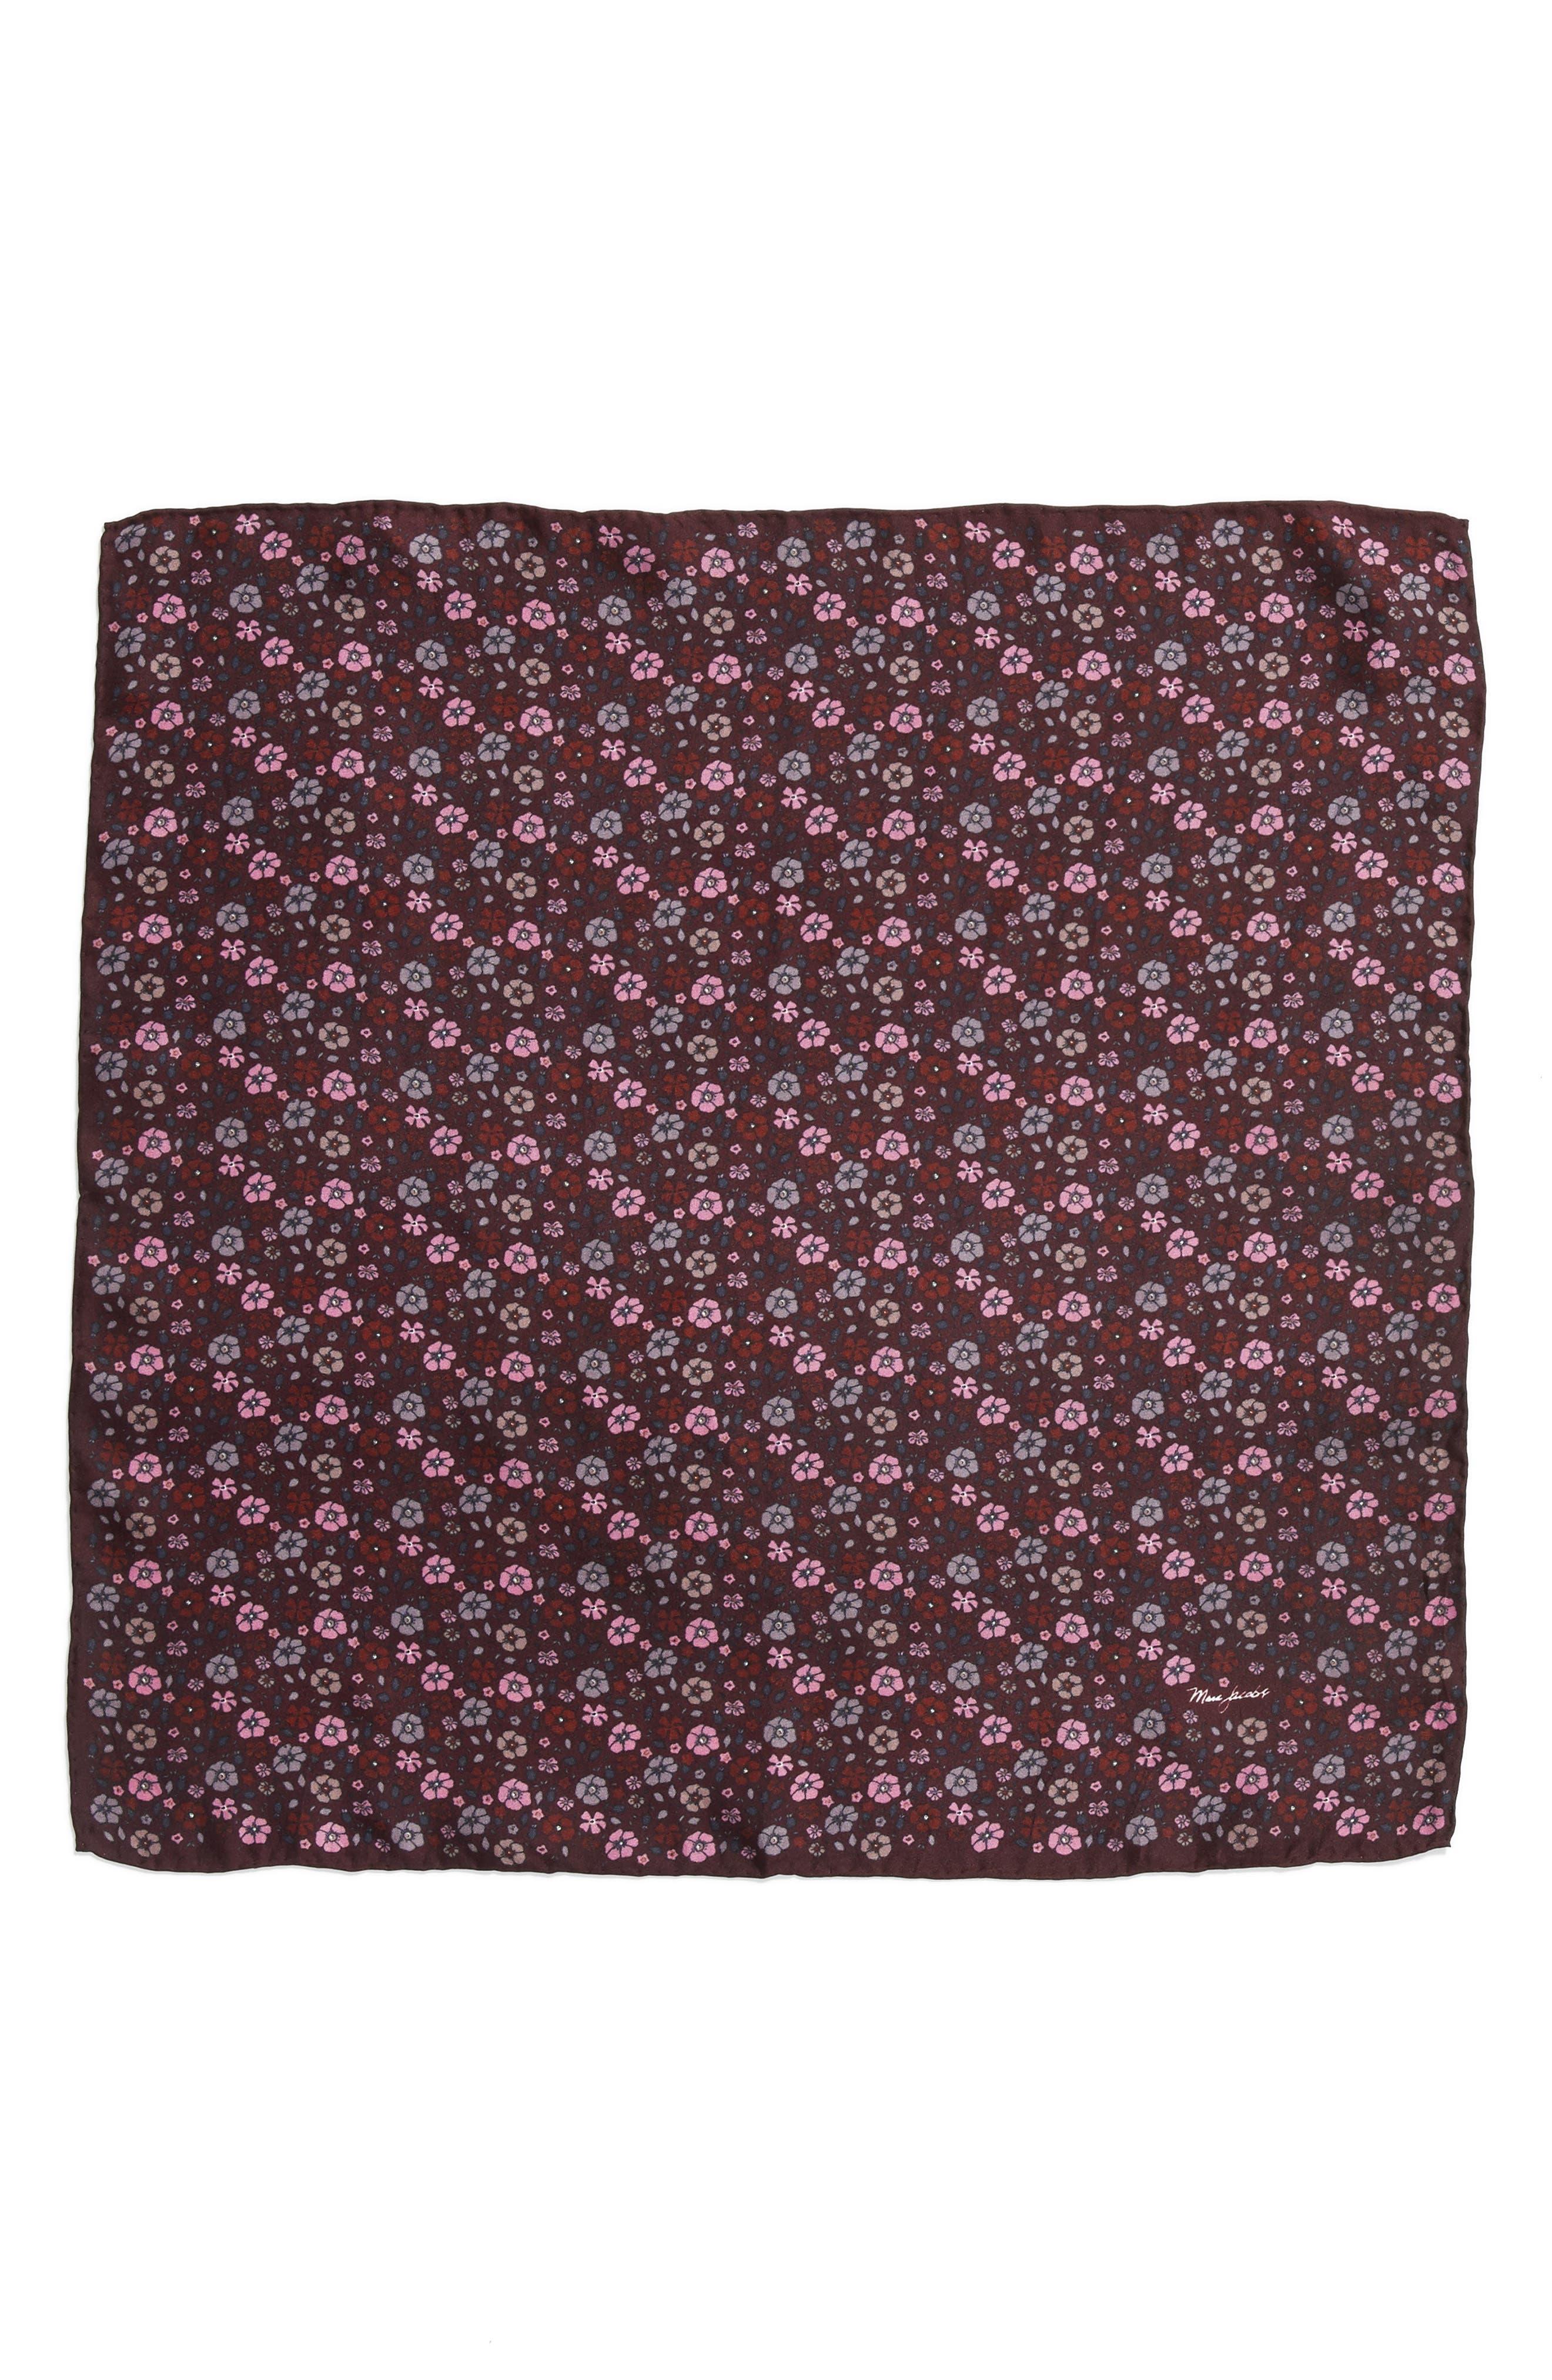 Alternate Image 1 Selected - MARC JACOBS Floral Silk Bandana